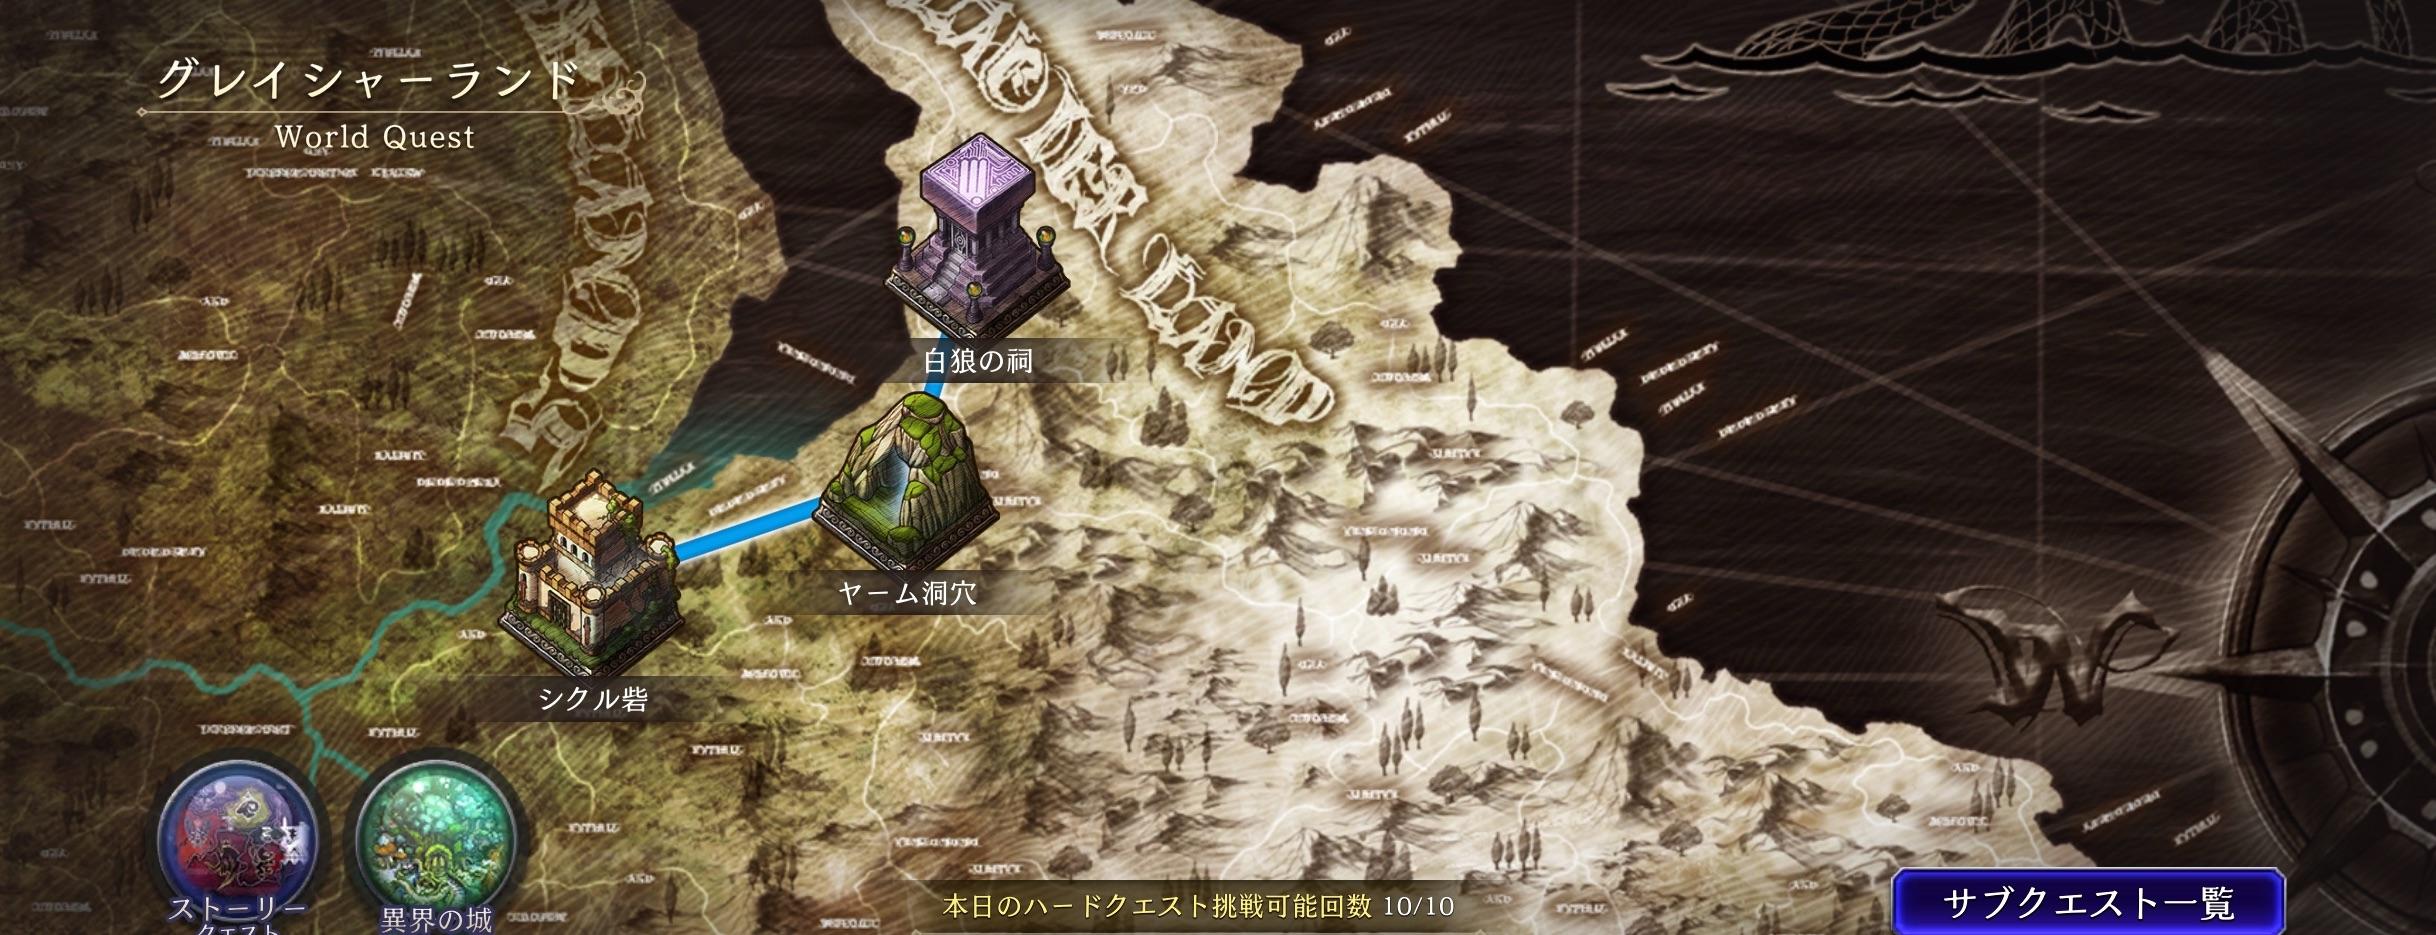 ffbe_world-map02